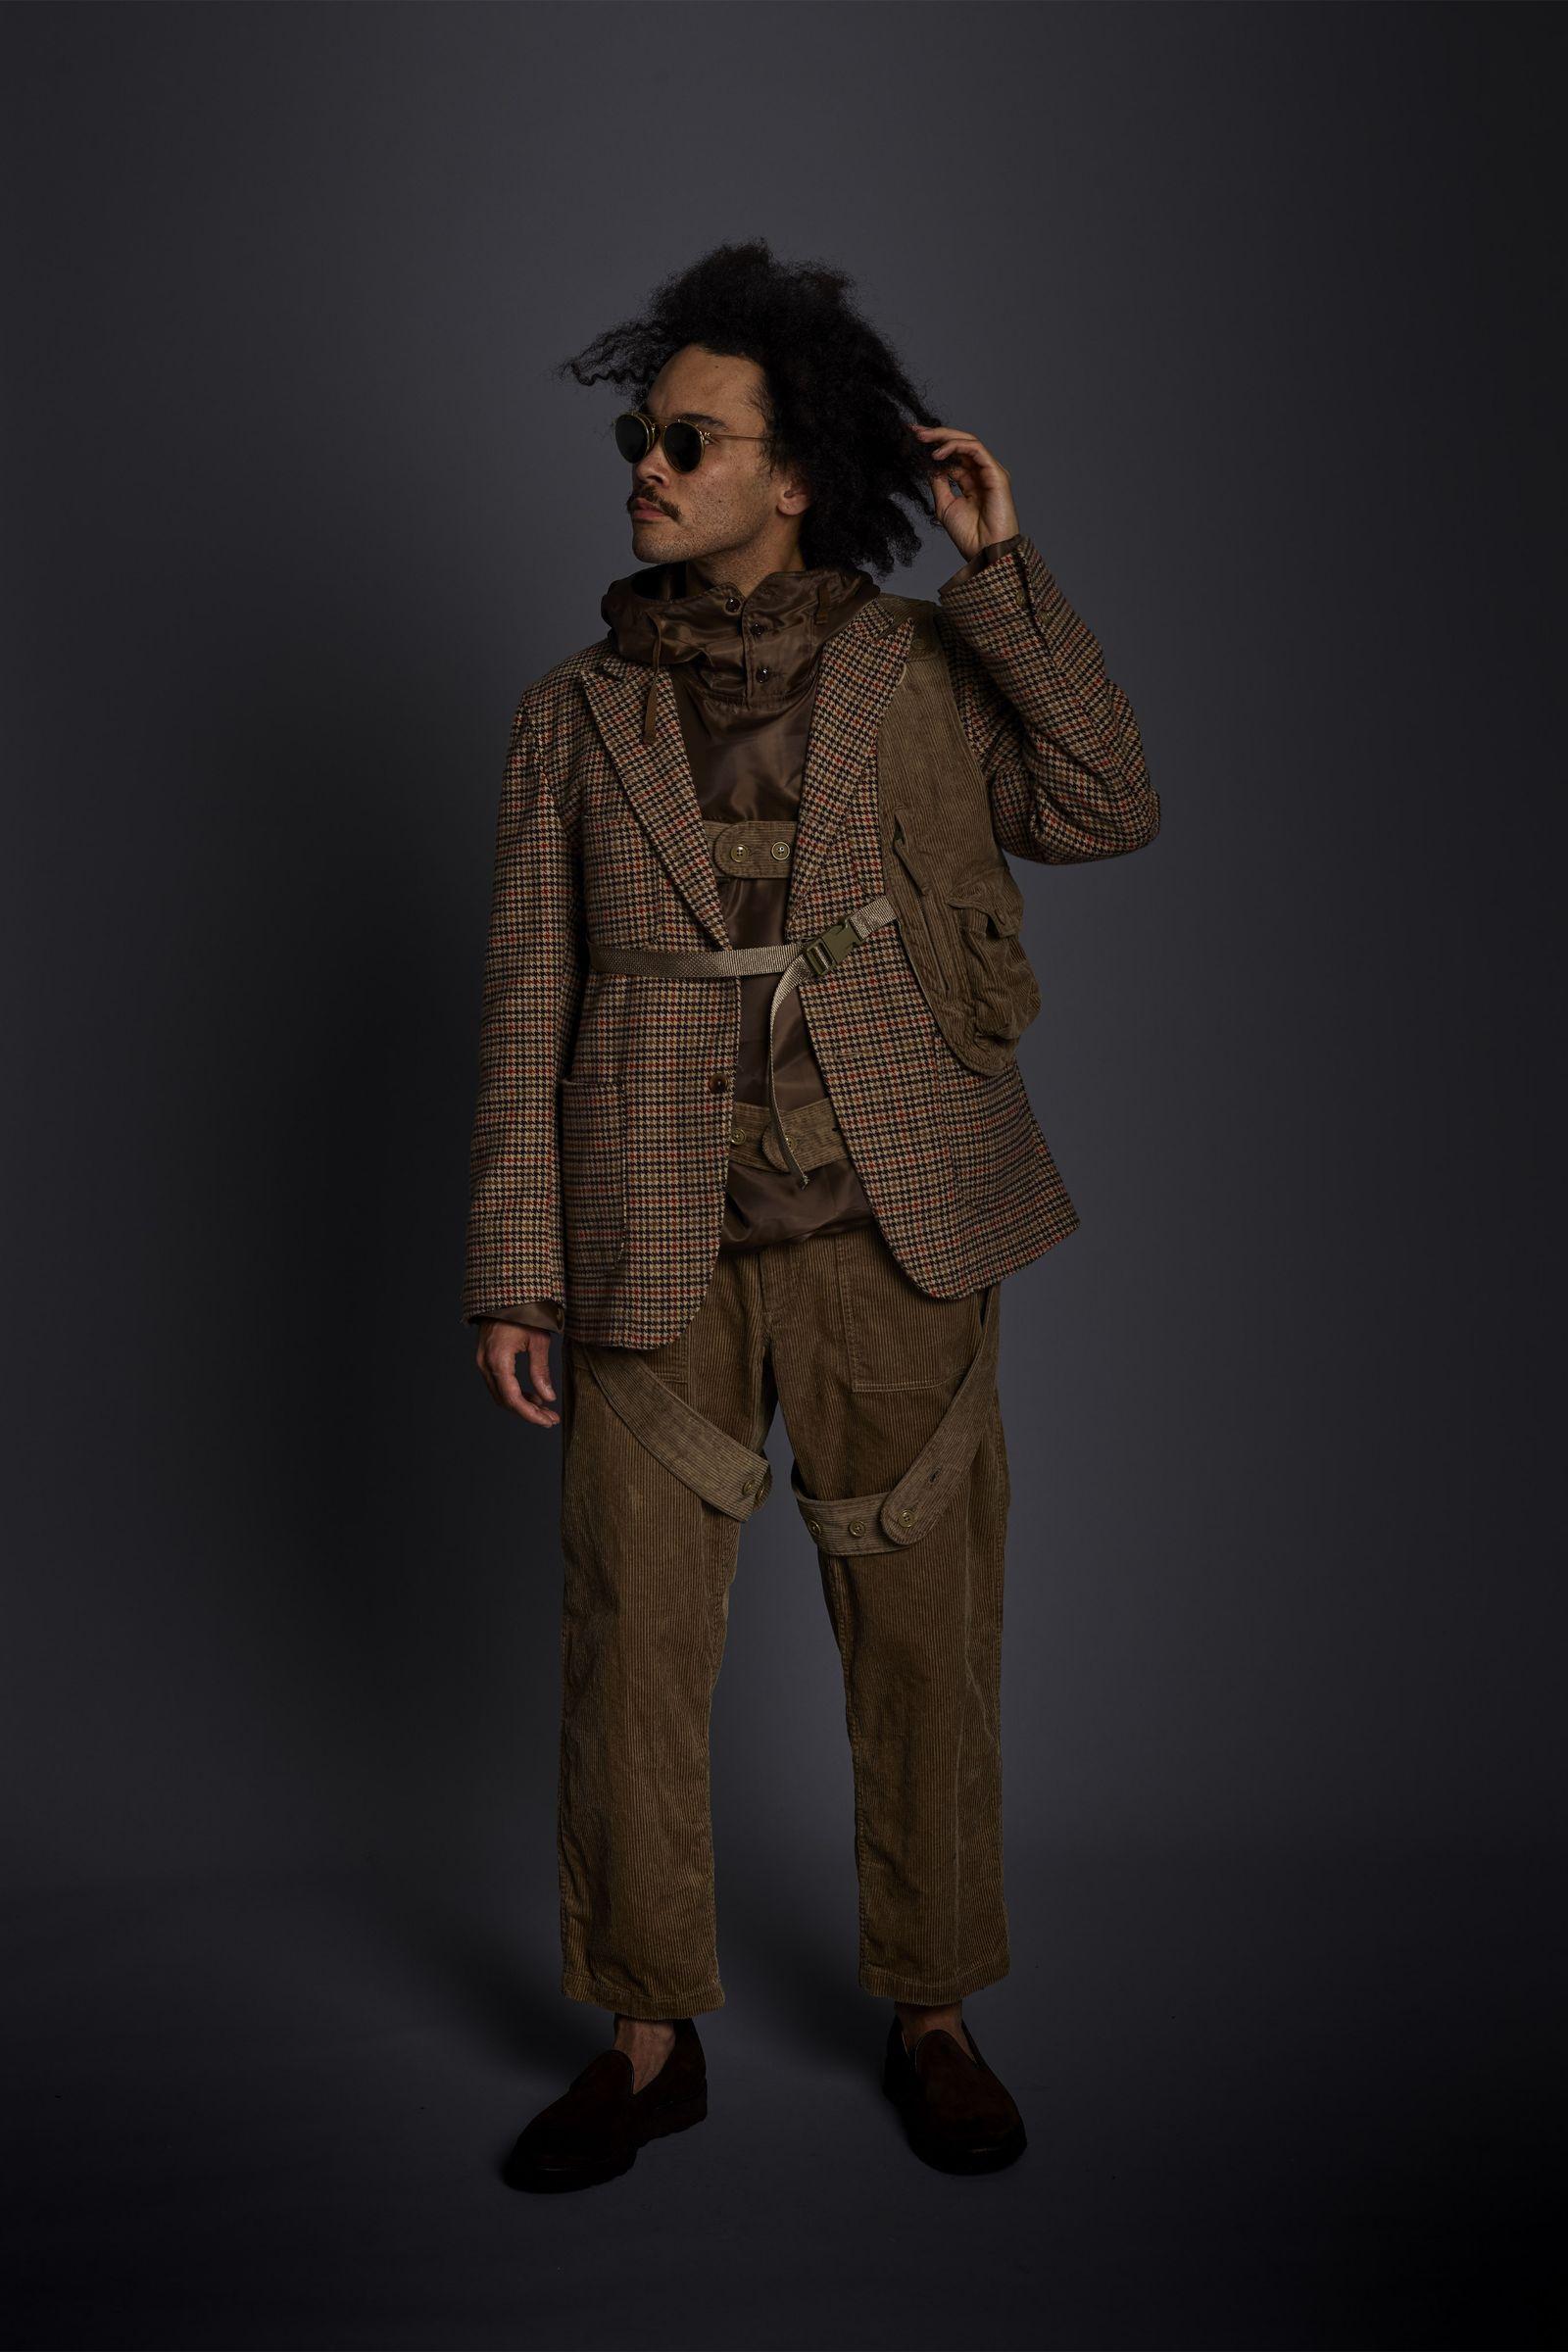 engineered-garments-fall-winter-2020-02